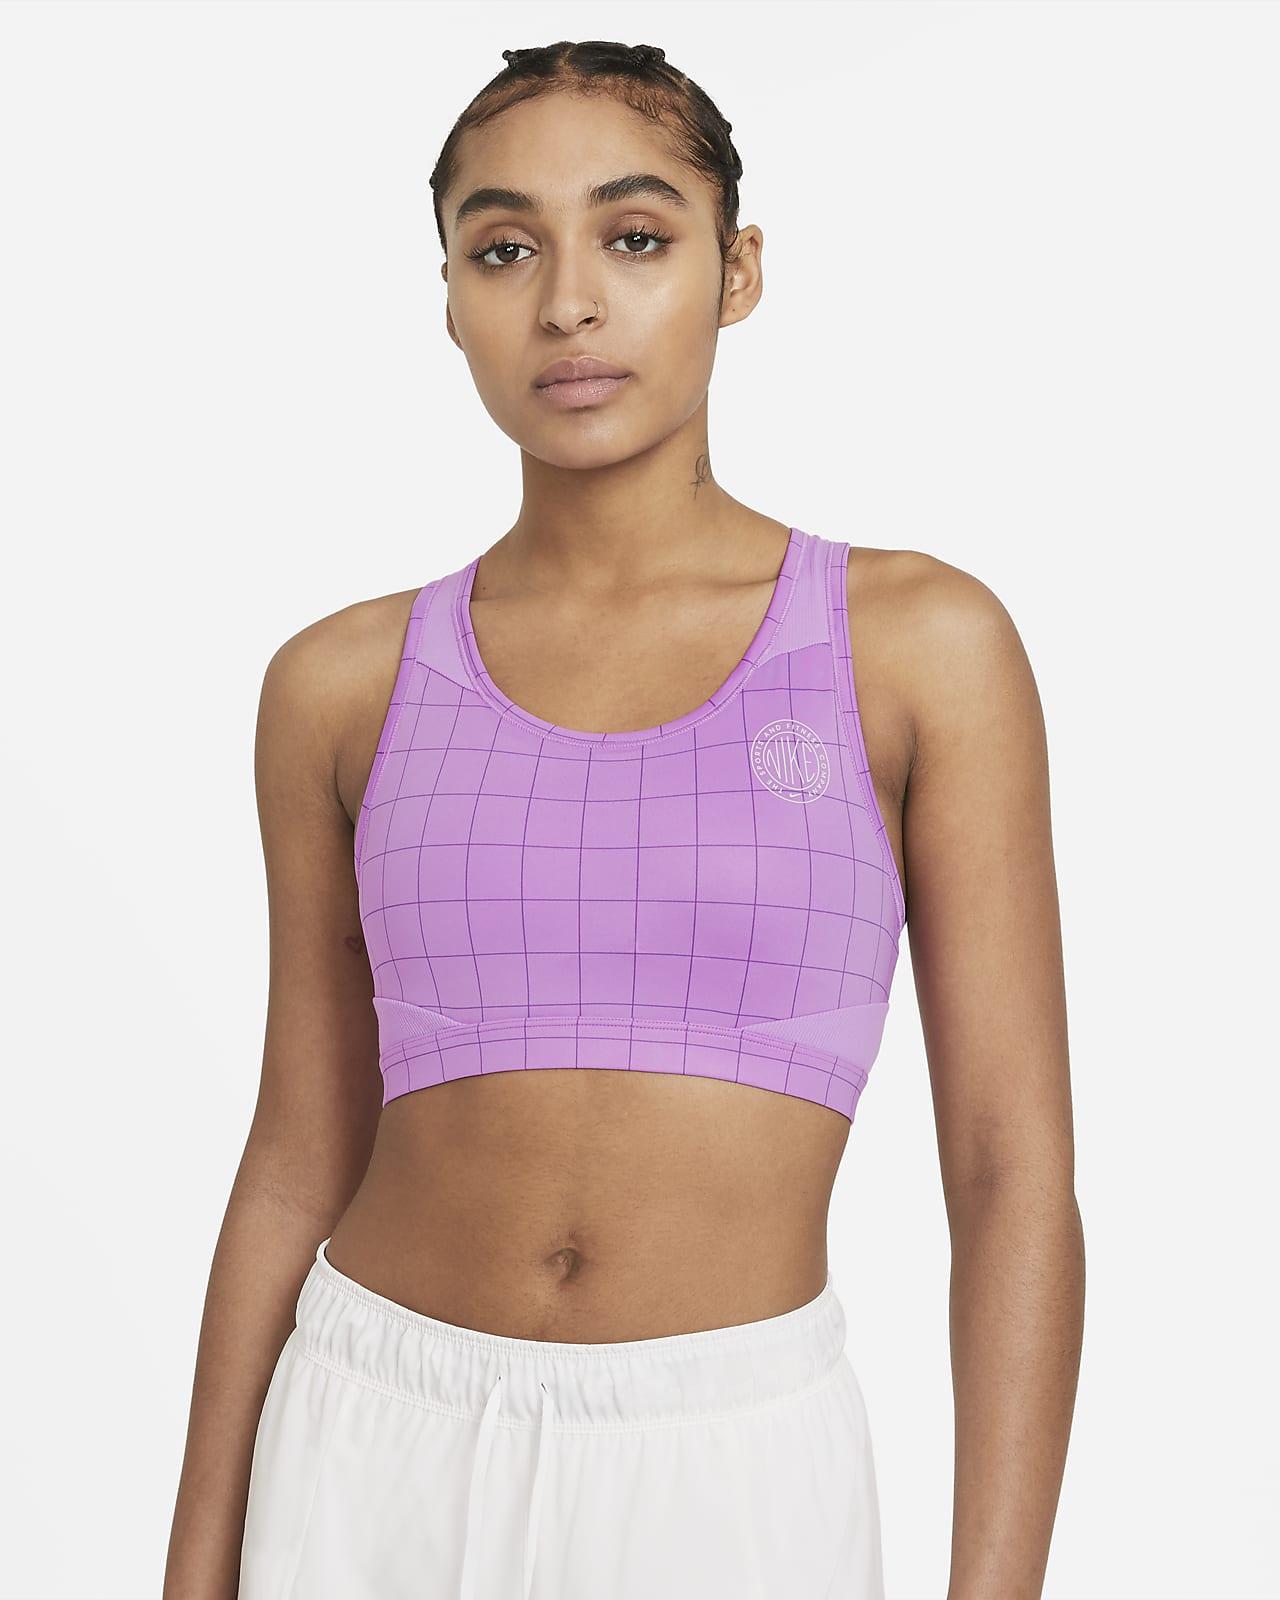 Nike Swoosh Femme Women's Medium-Support 1-Piece Pad Printed Sports Bra